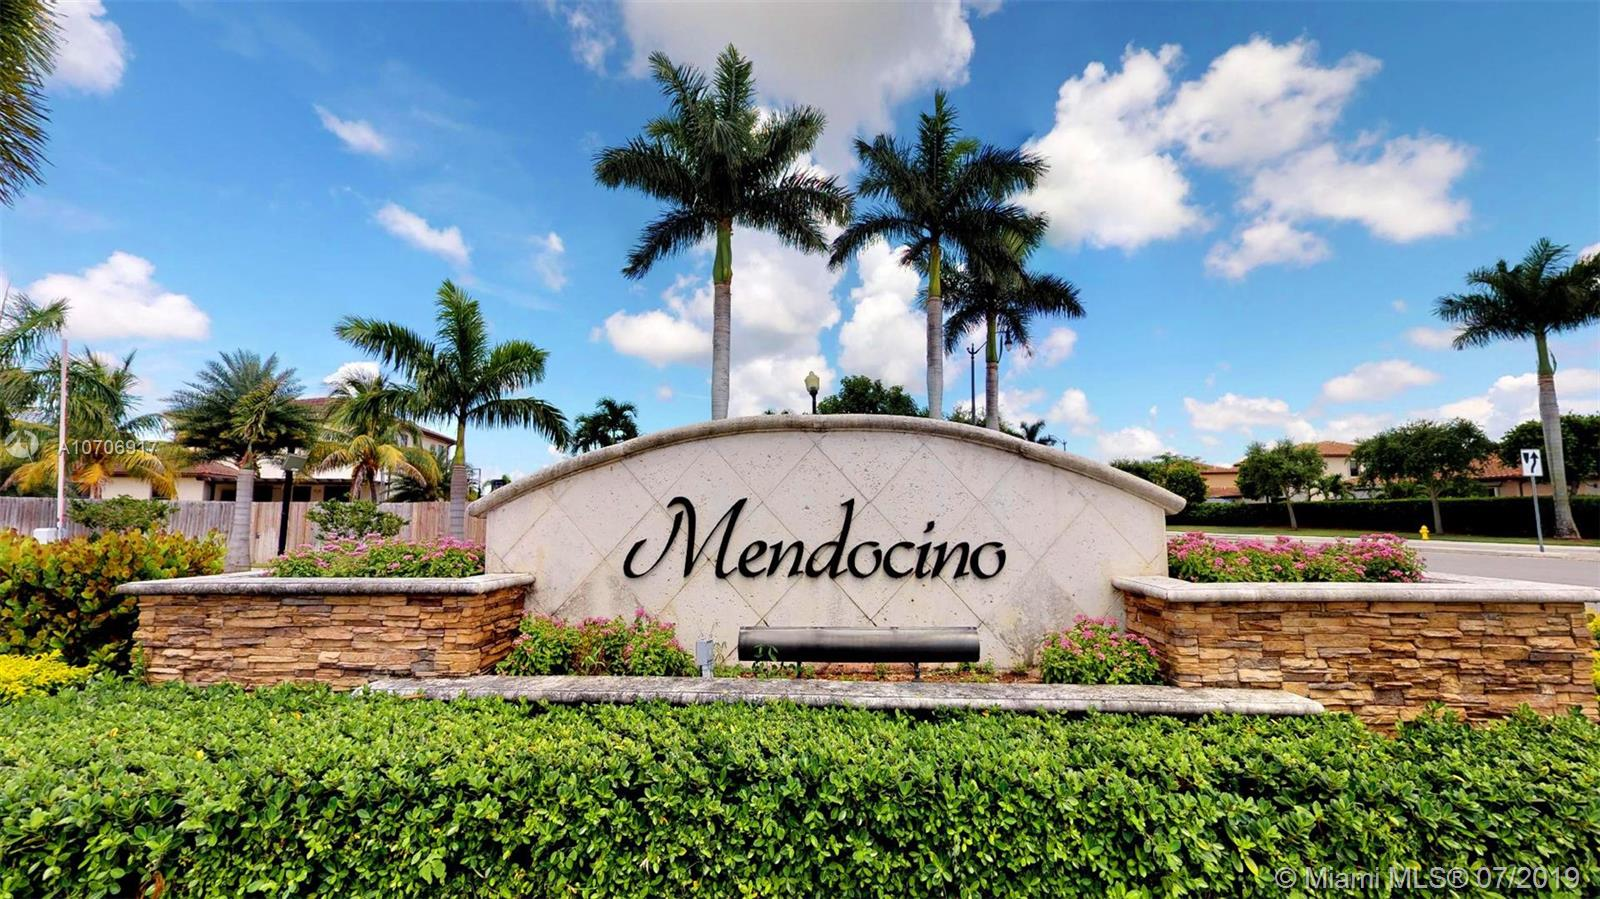 195 SE 34th Pl, Homestead, FL 33033 - Homestead, FL real estate listing